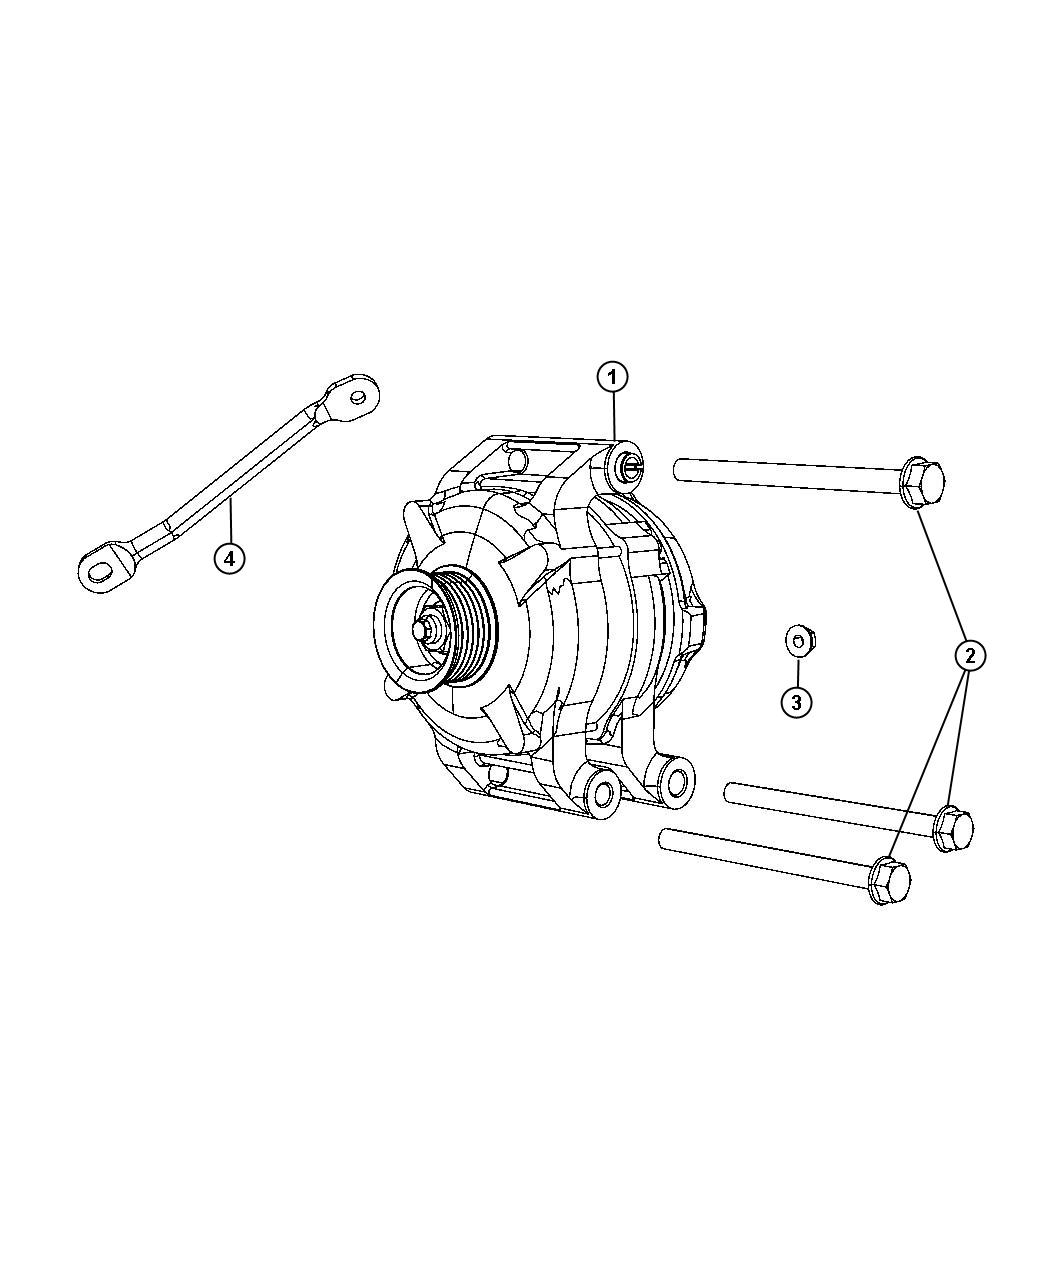 Chrysler 300 Strut Alternator Bracket Engine Side Rwd